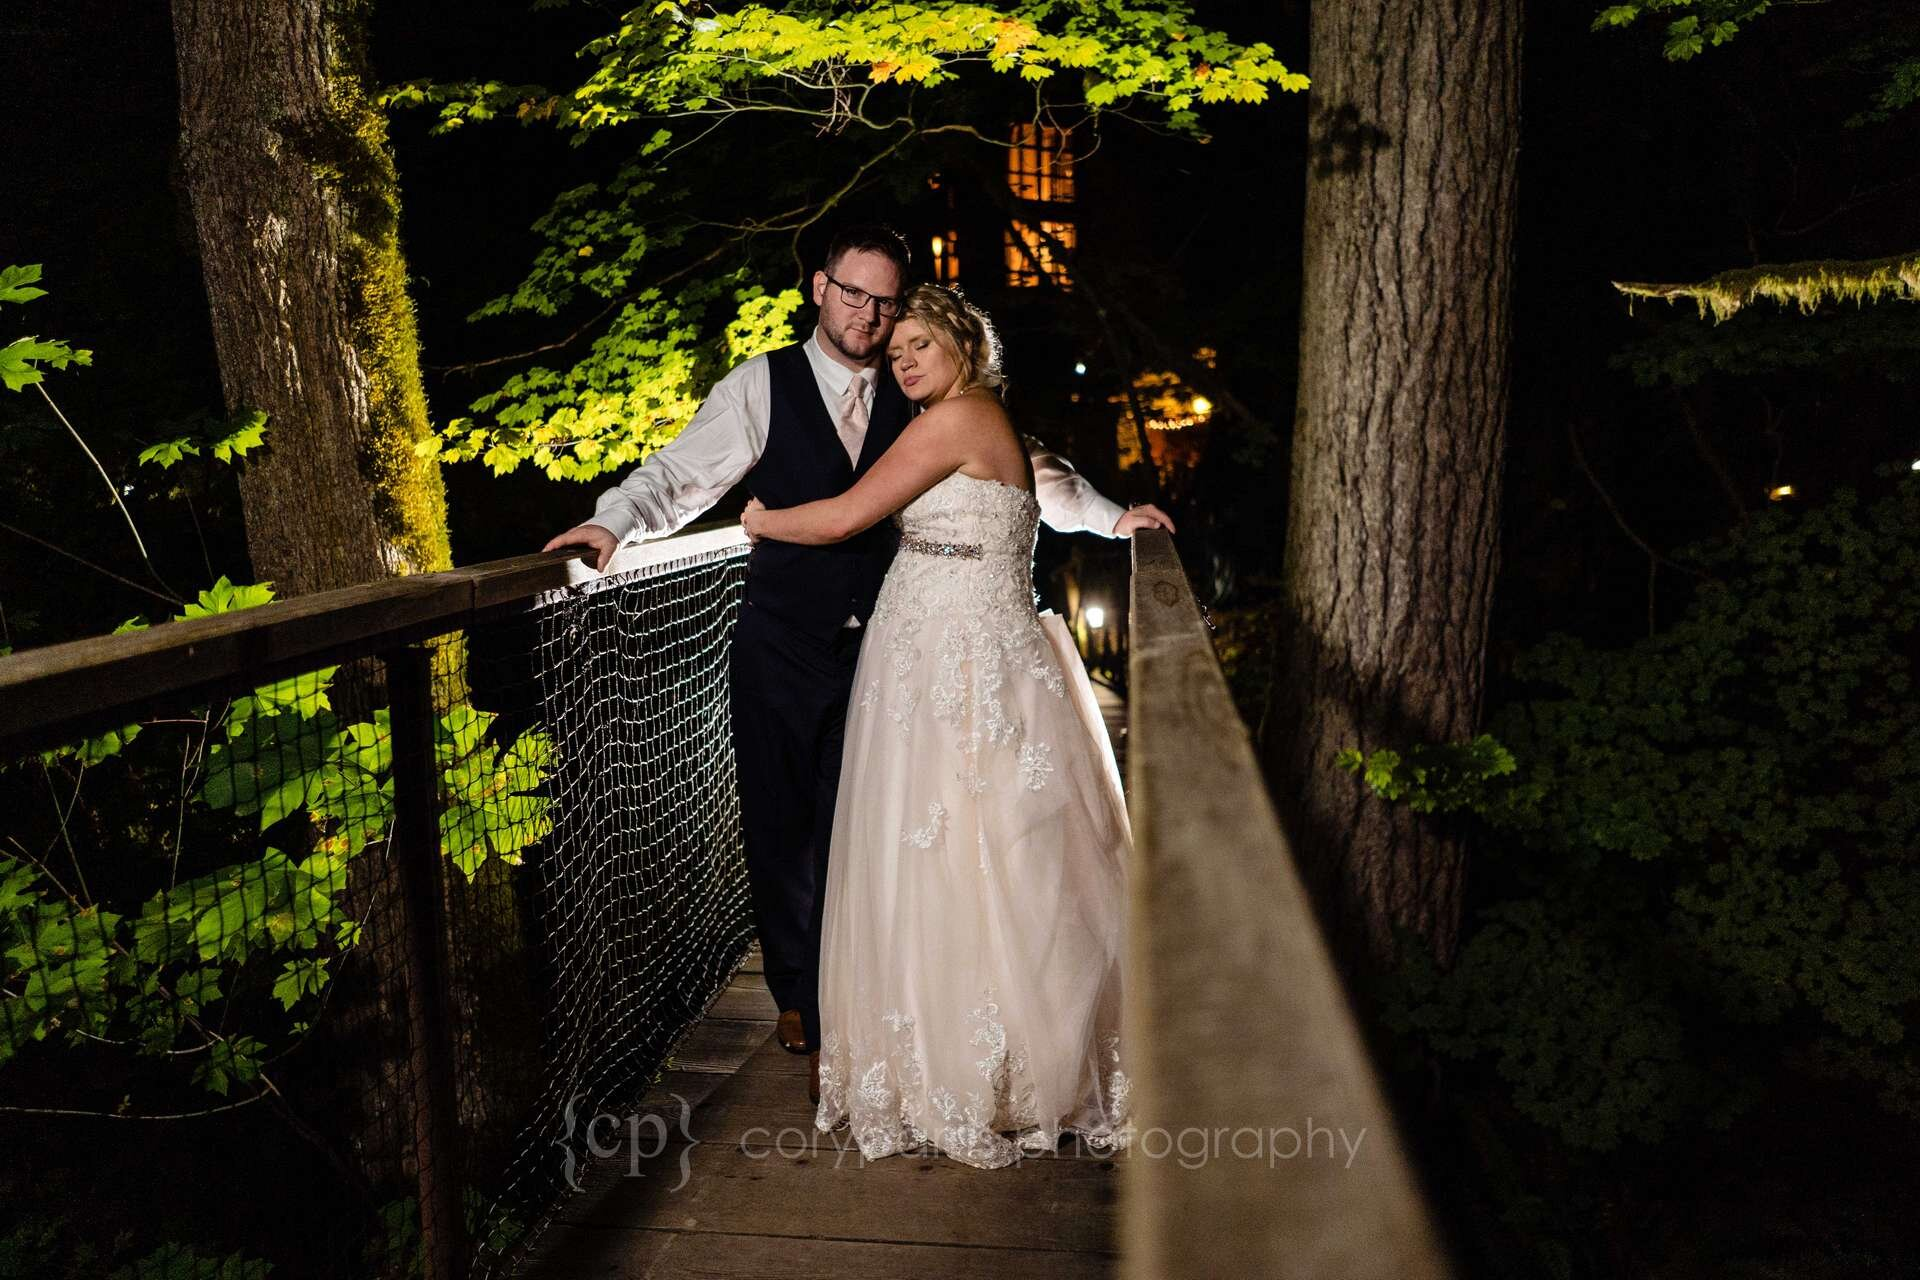 785-treehouse-point-wedding-photography.jpg